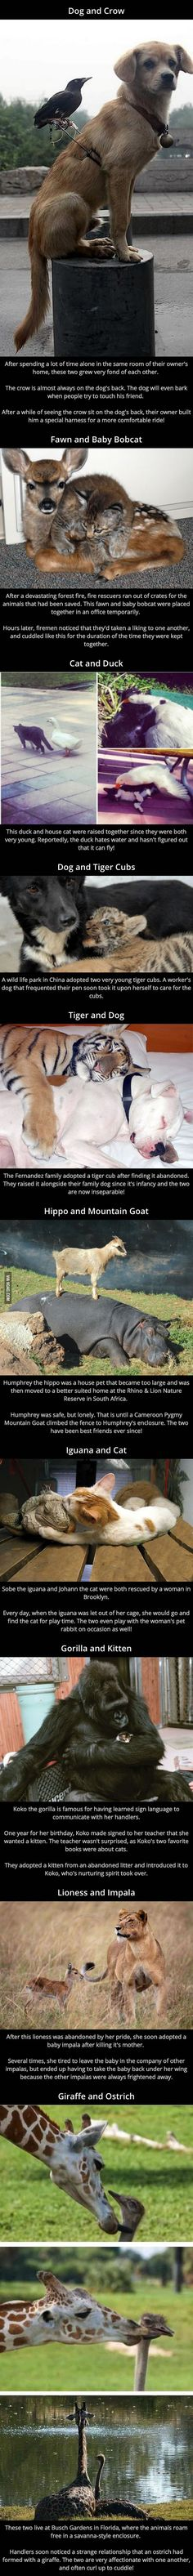 GAGBAY - Unusual Animal Friendships